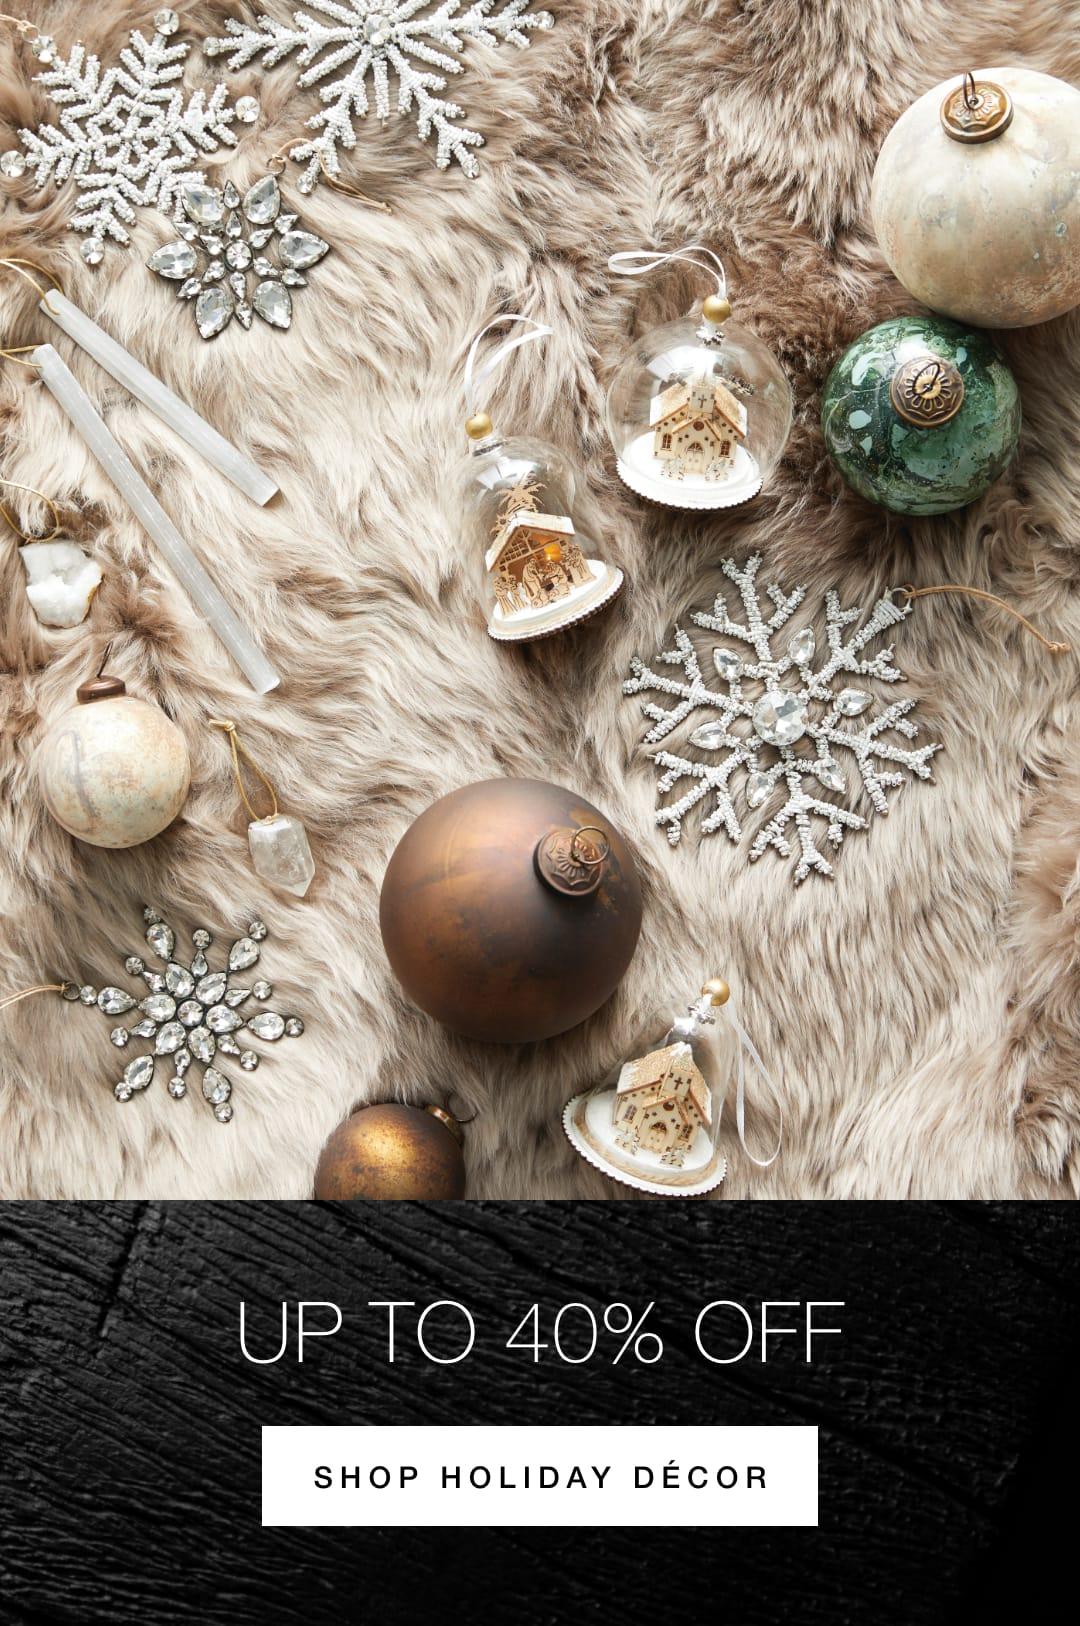 Shop Holiday Decor